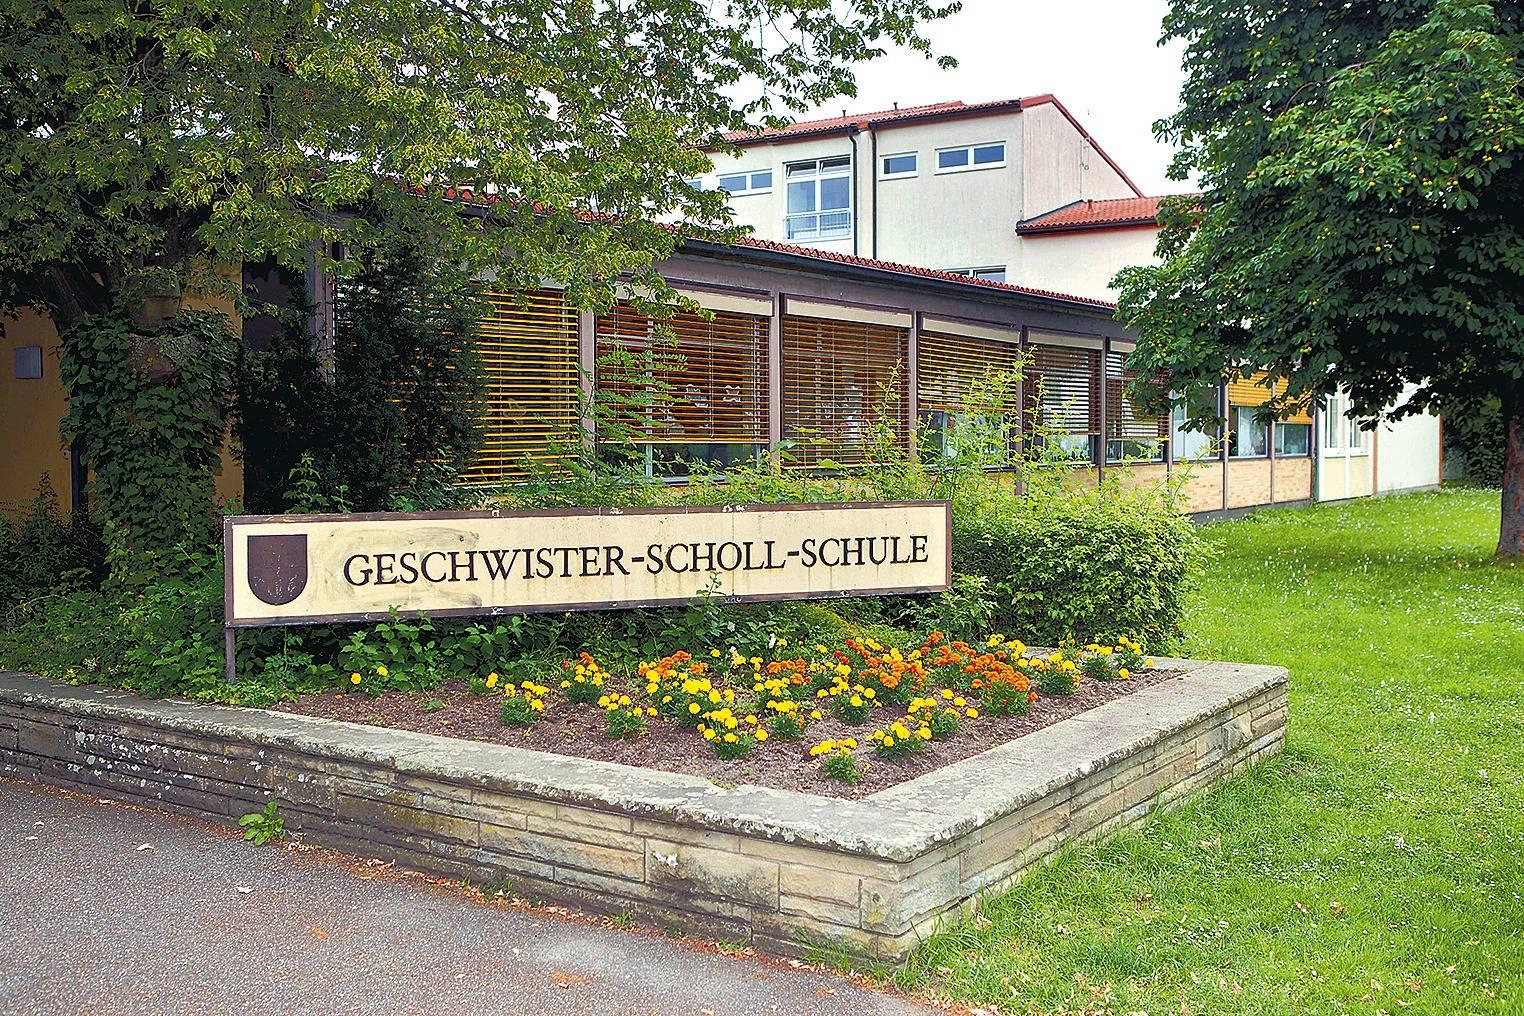 Geschwister Scholl Schule Göttingen